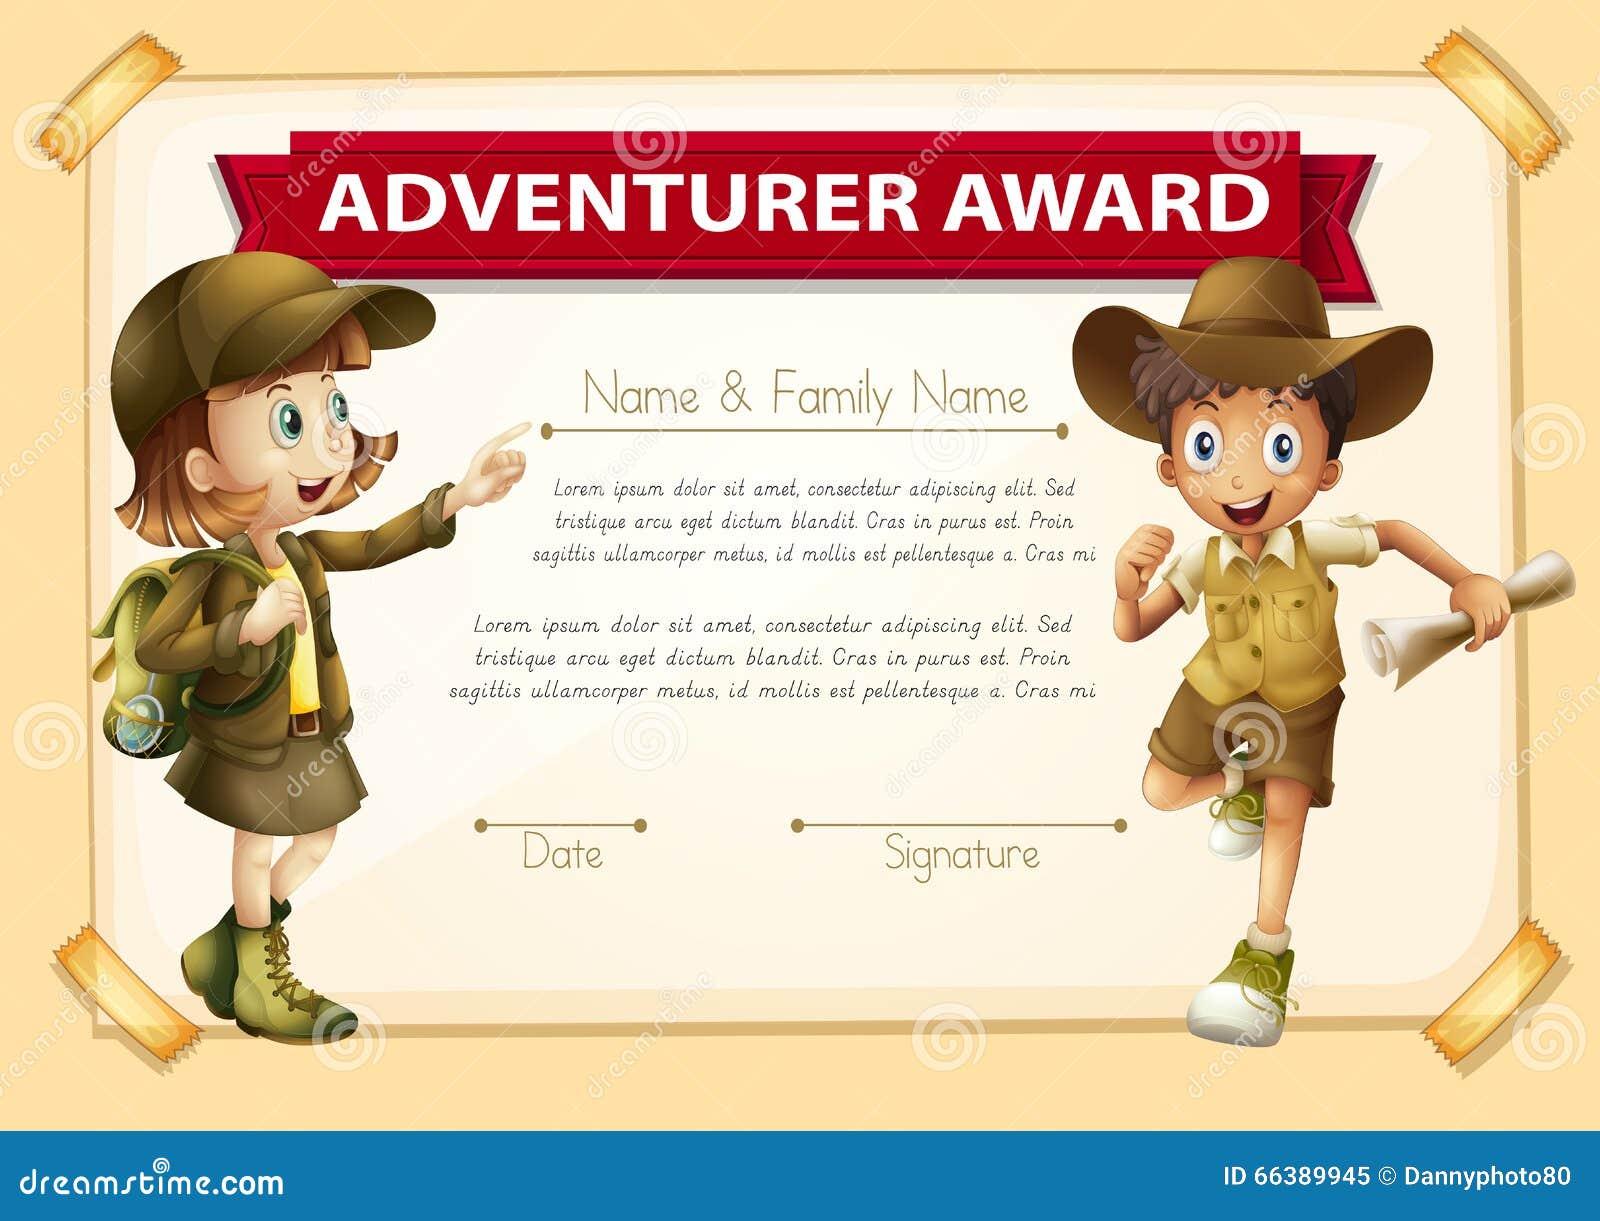 adventure award with two children background stock vector illustration of kids clip 66389945. Black Bedroom Furniture Sets. Home Design Ideas